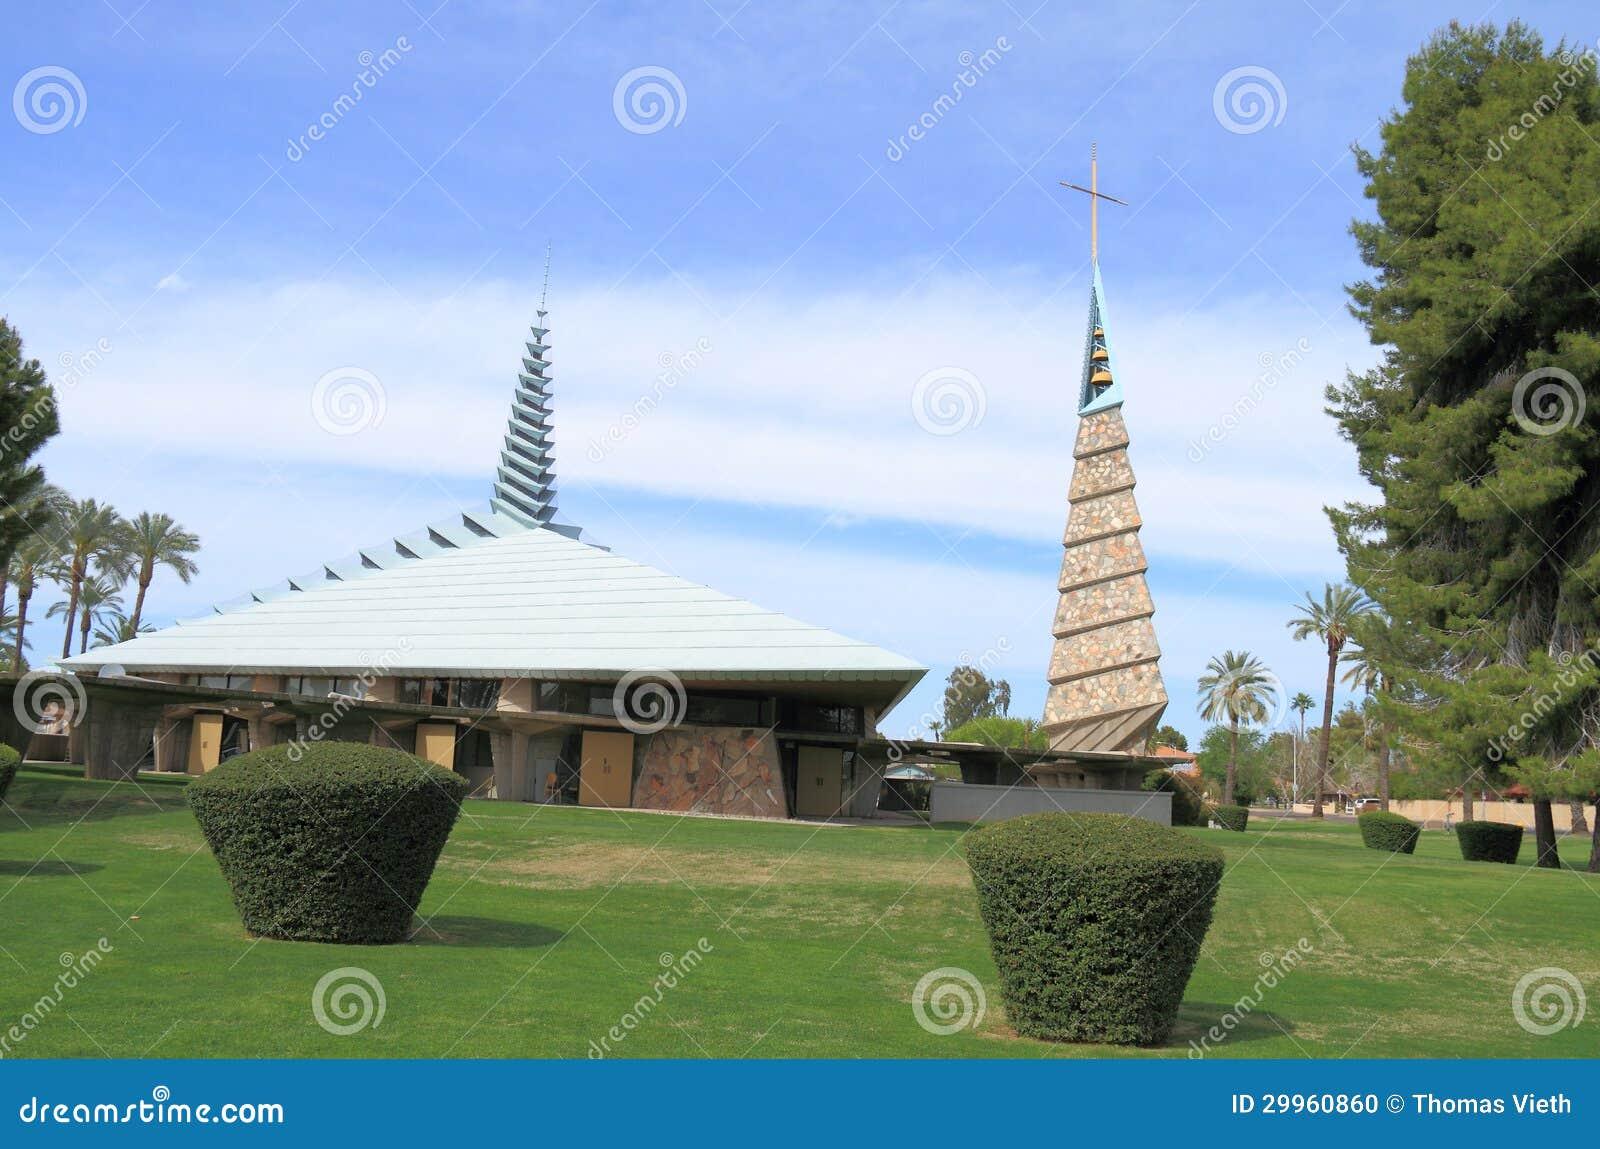 Frank lloyd wright chiesa a phoenix immagine editoriale for Franco piani di lloyd wright